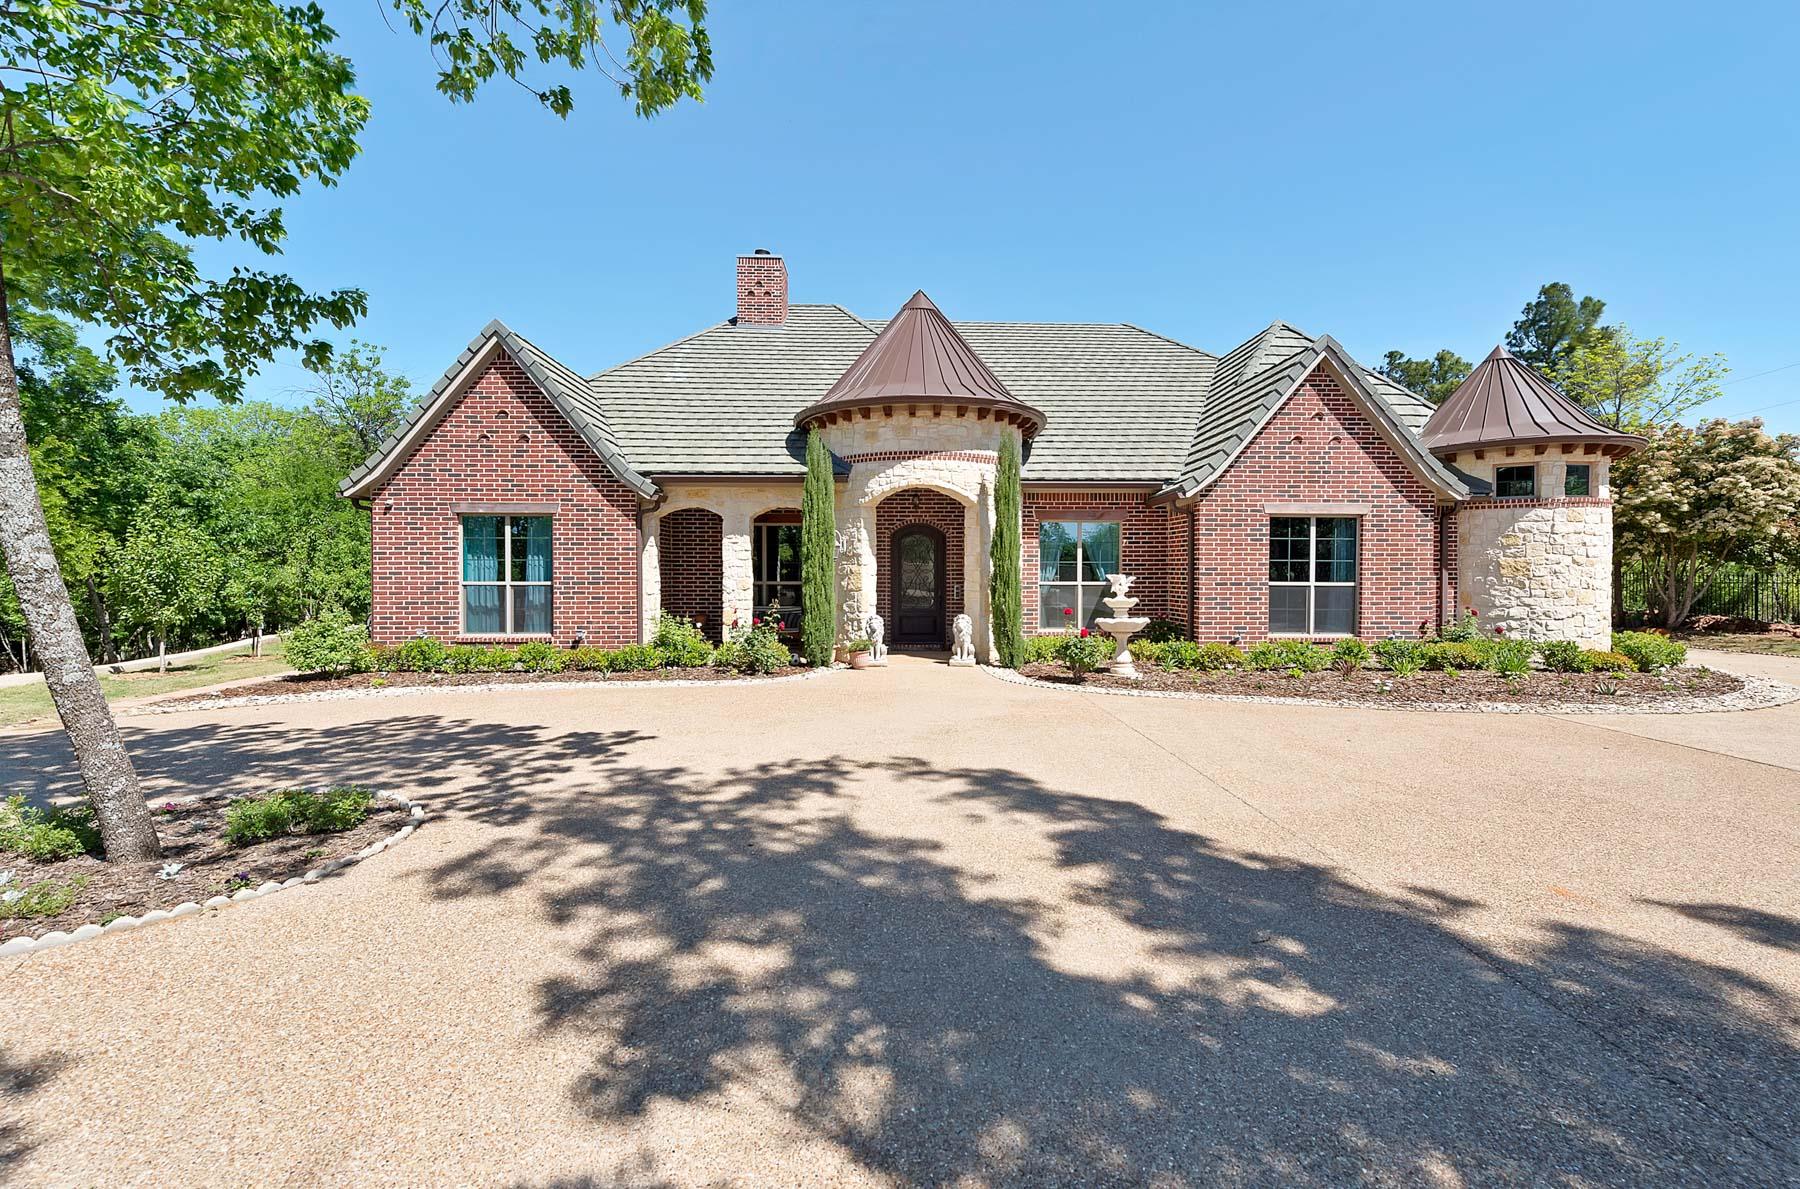 Villa per Vendita alle ore Exquisite one story situated on an acre of pristine country property 2021 Briar Hill Lane Argyle, Texas, 76226 Stati Uniti